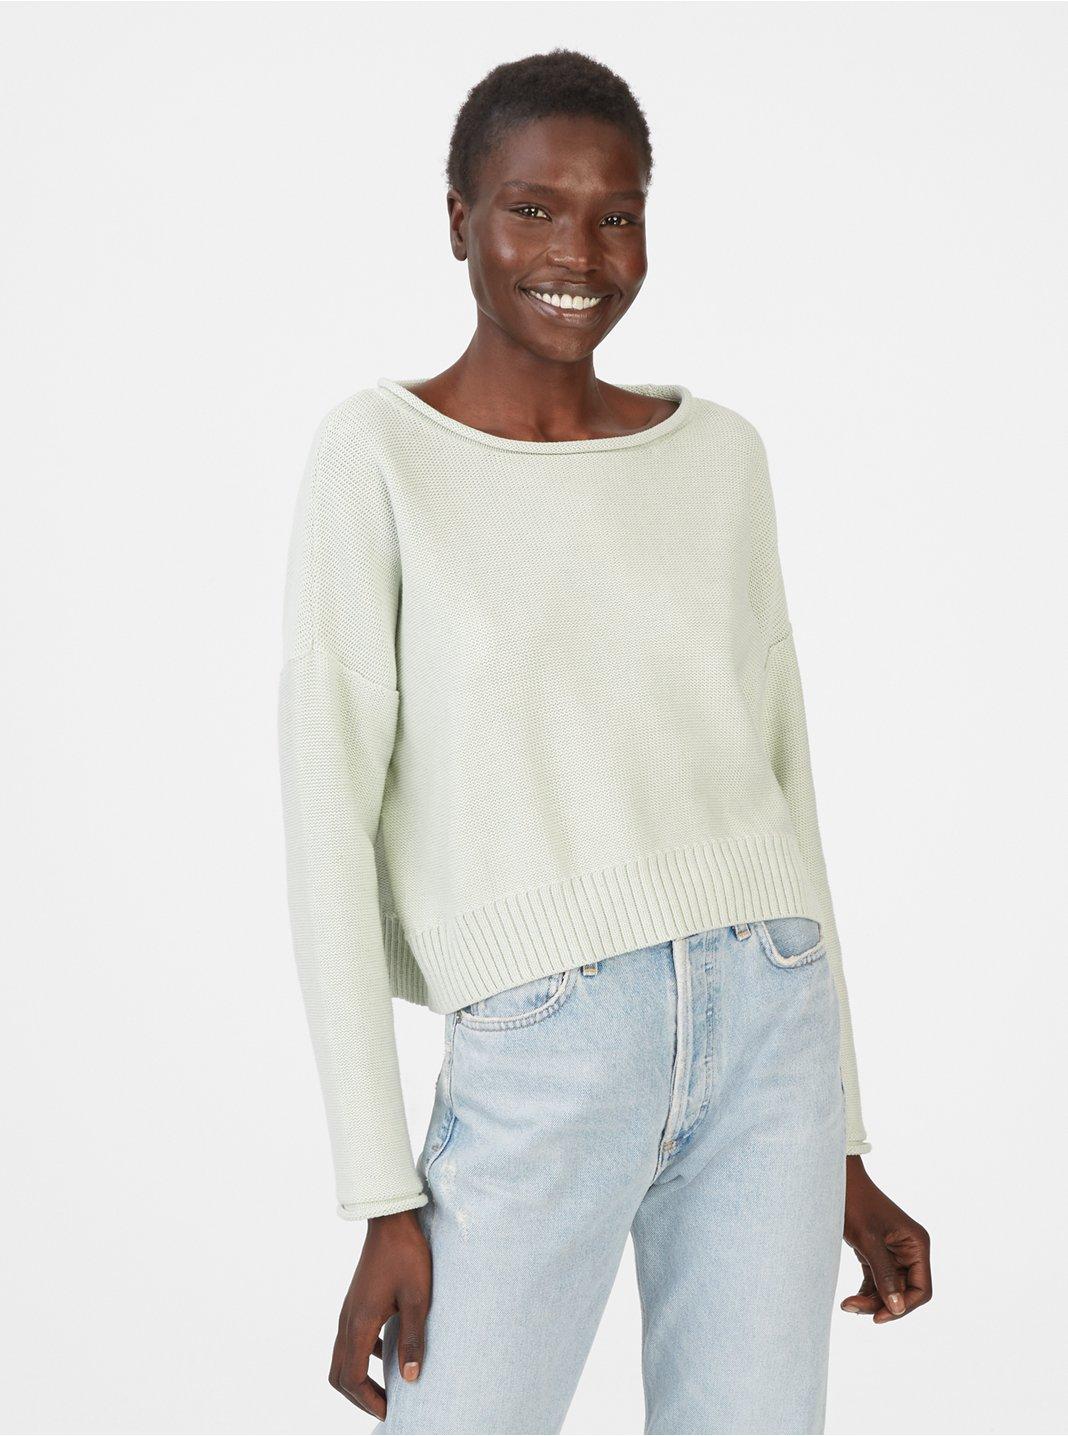 Burmeena Cotton Sweater